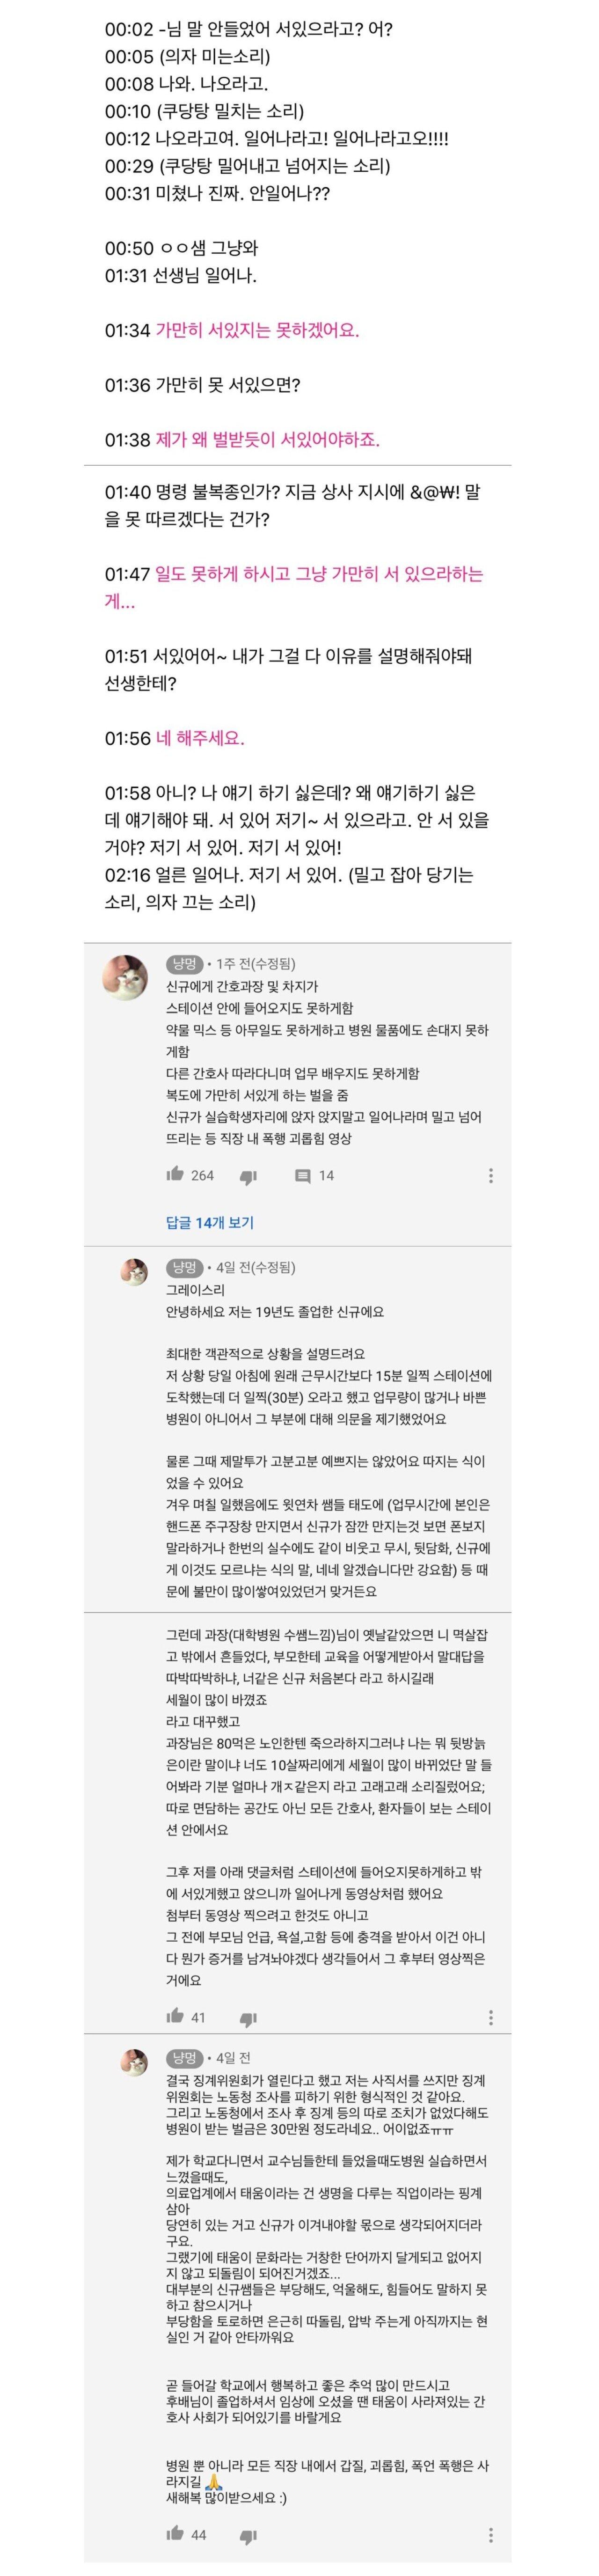 1.jpeg 논란 중이라는 성북구 간호사 태움 영상.jpg